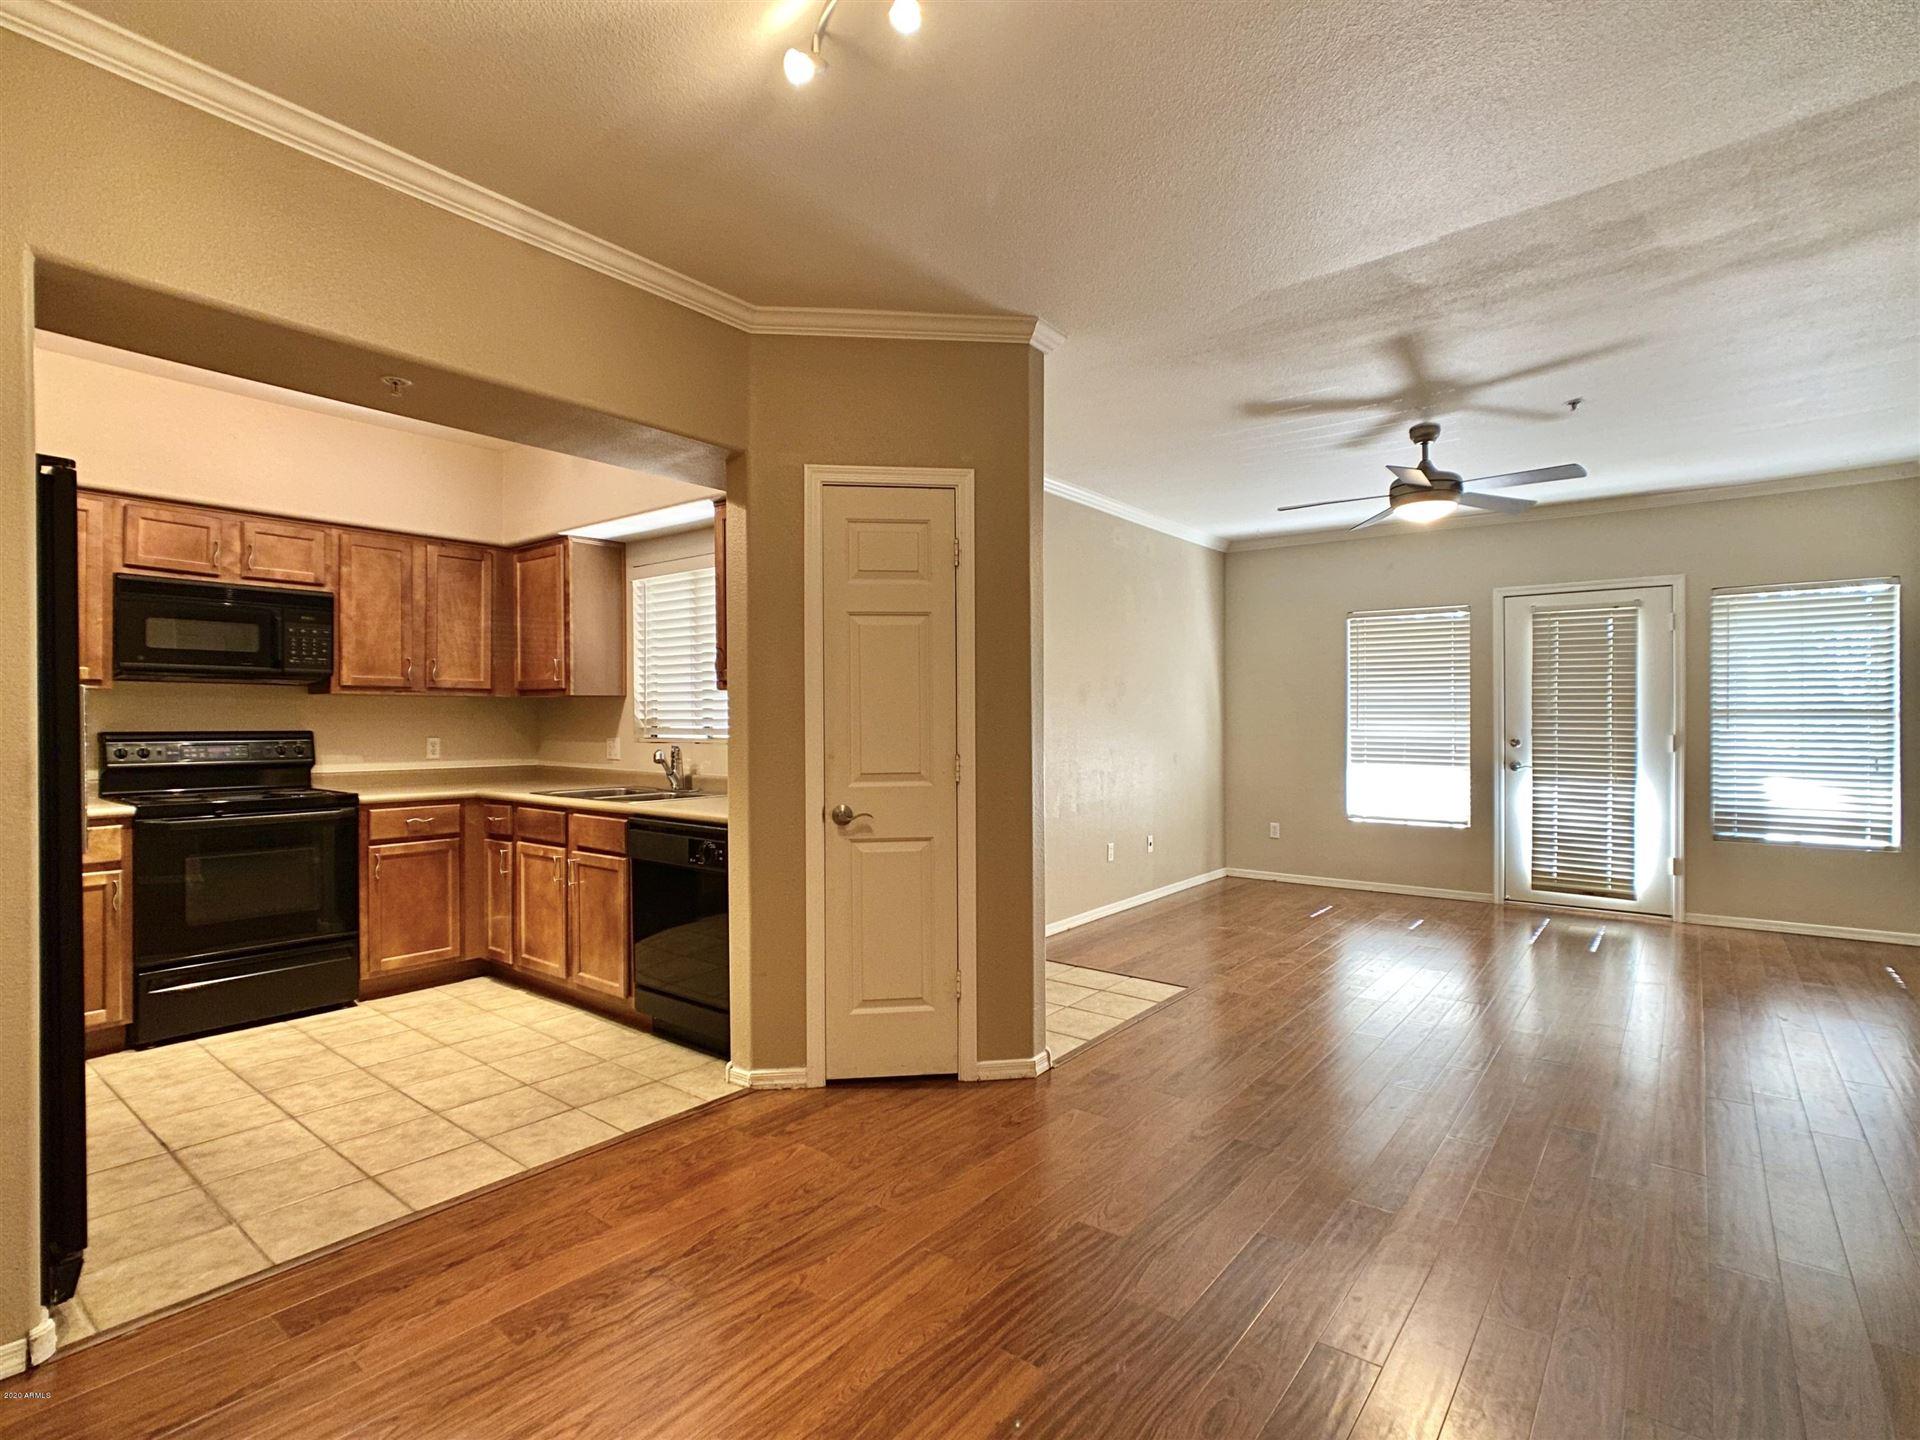 15095 N THOMPSON PEAK Parkway #3100, Scottsdale, AZ 85260 - MLS#: 6132672